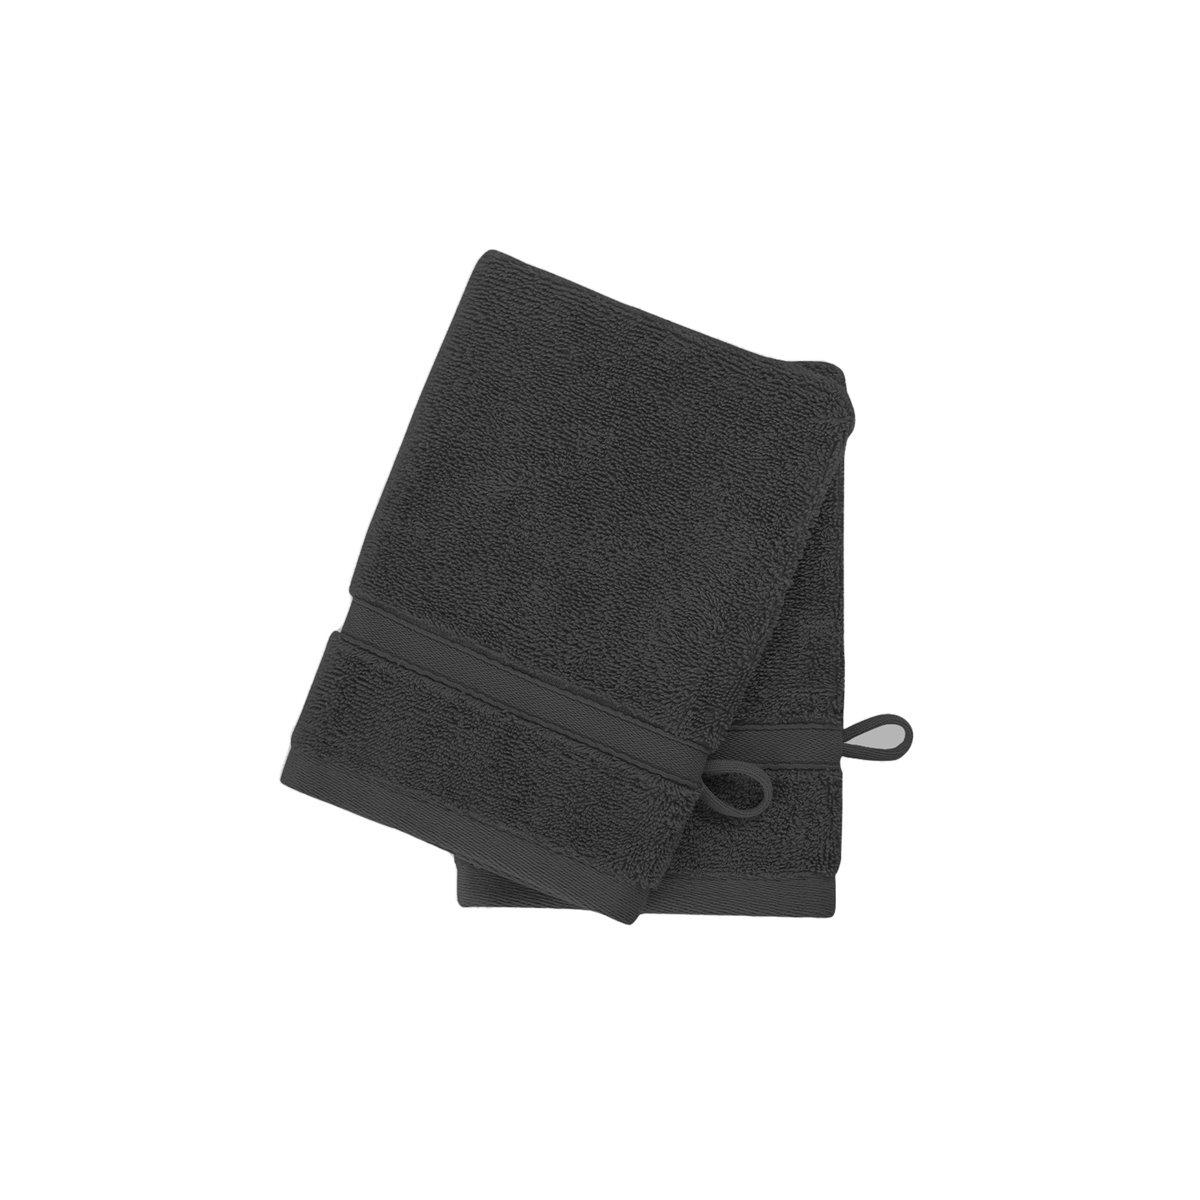 2 gants en coton bio Carbone 16x22 cm